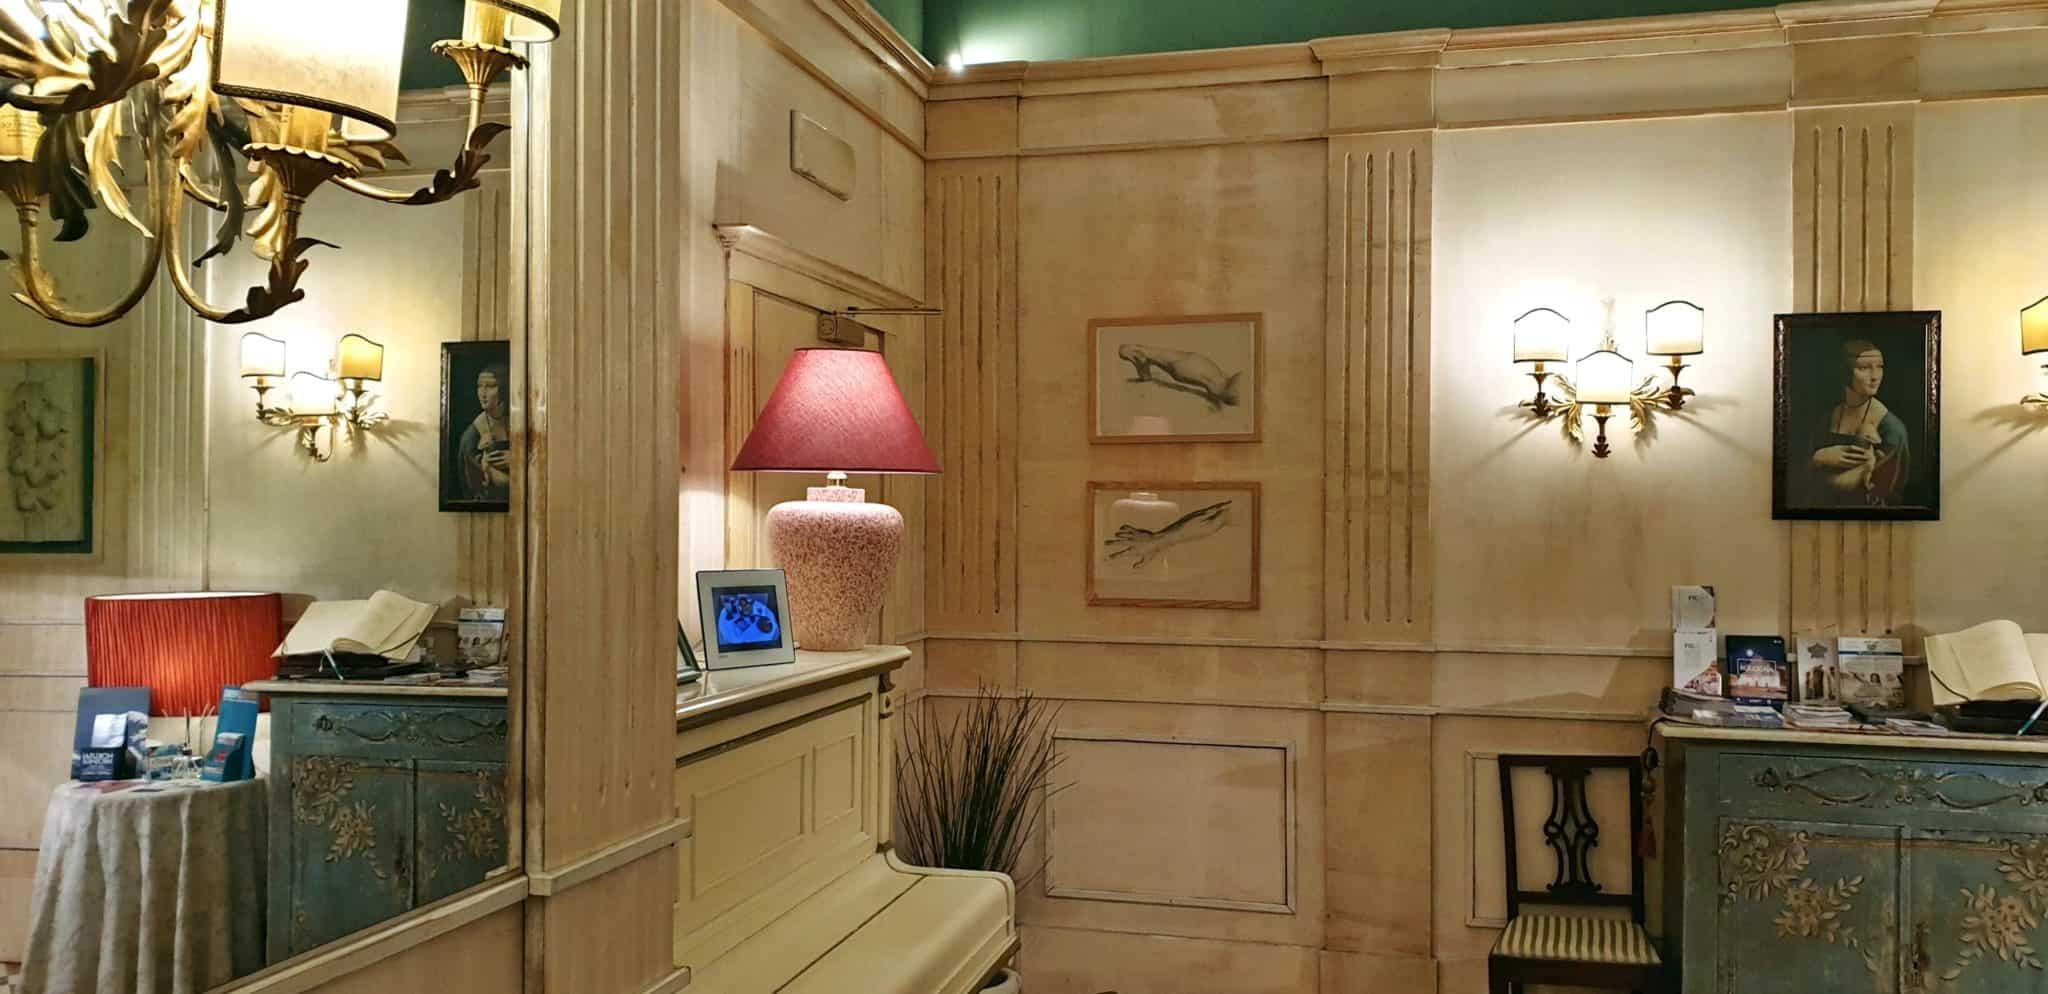 Hotel a Bologna - Centro Storico